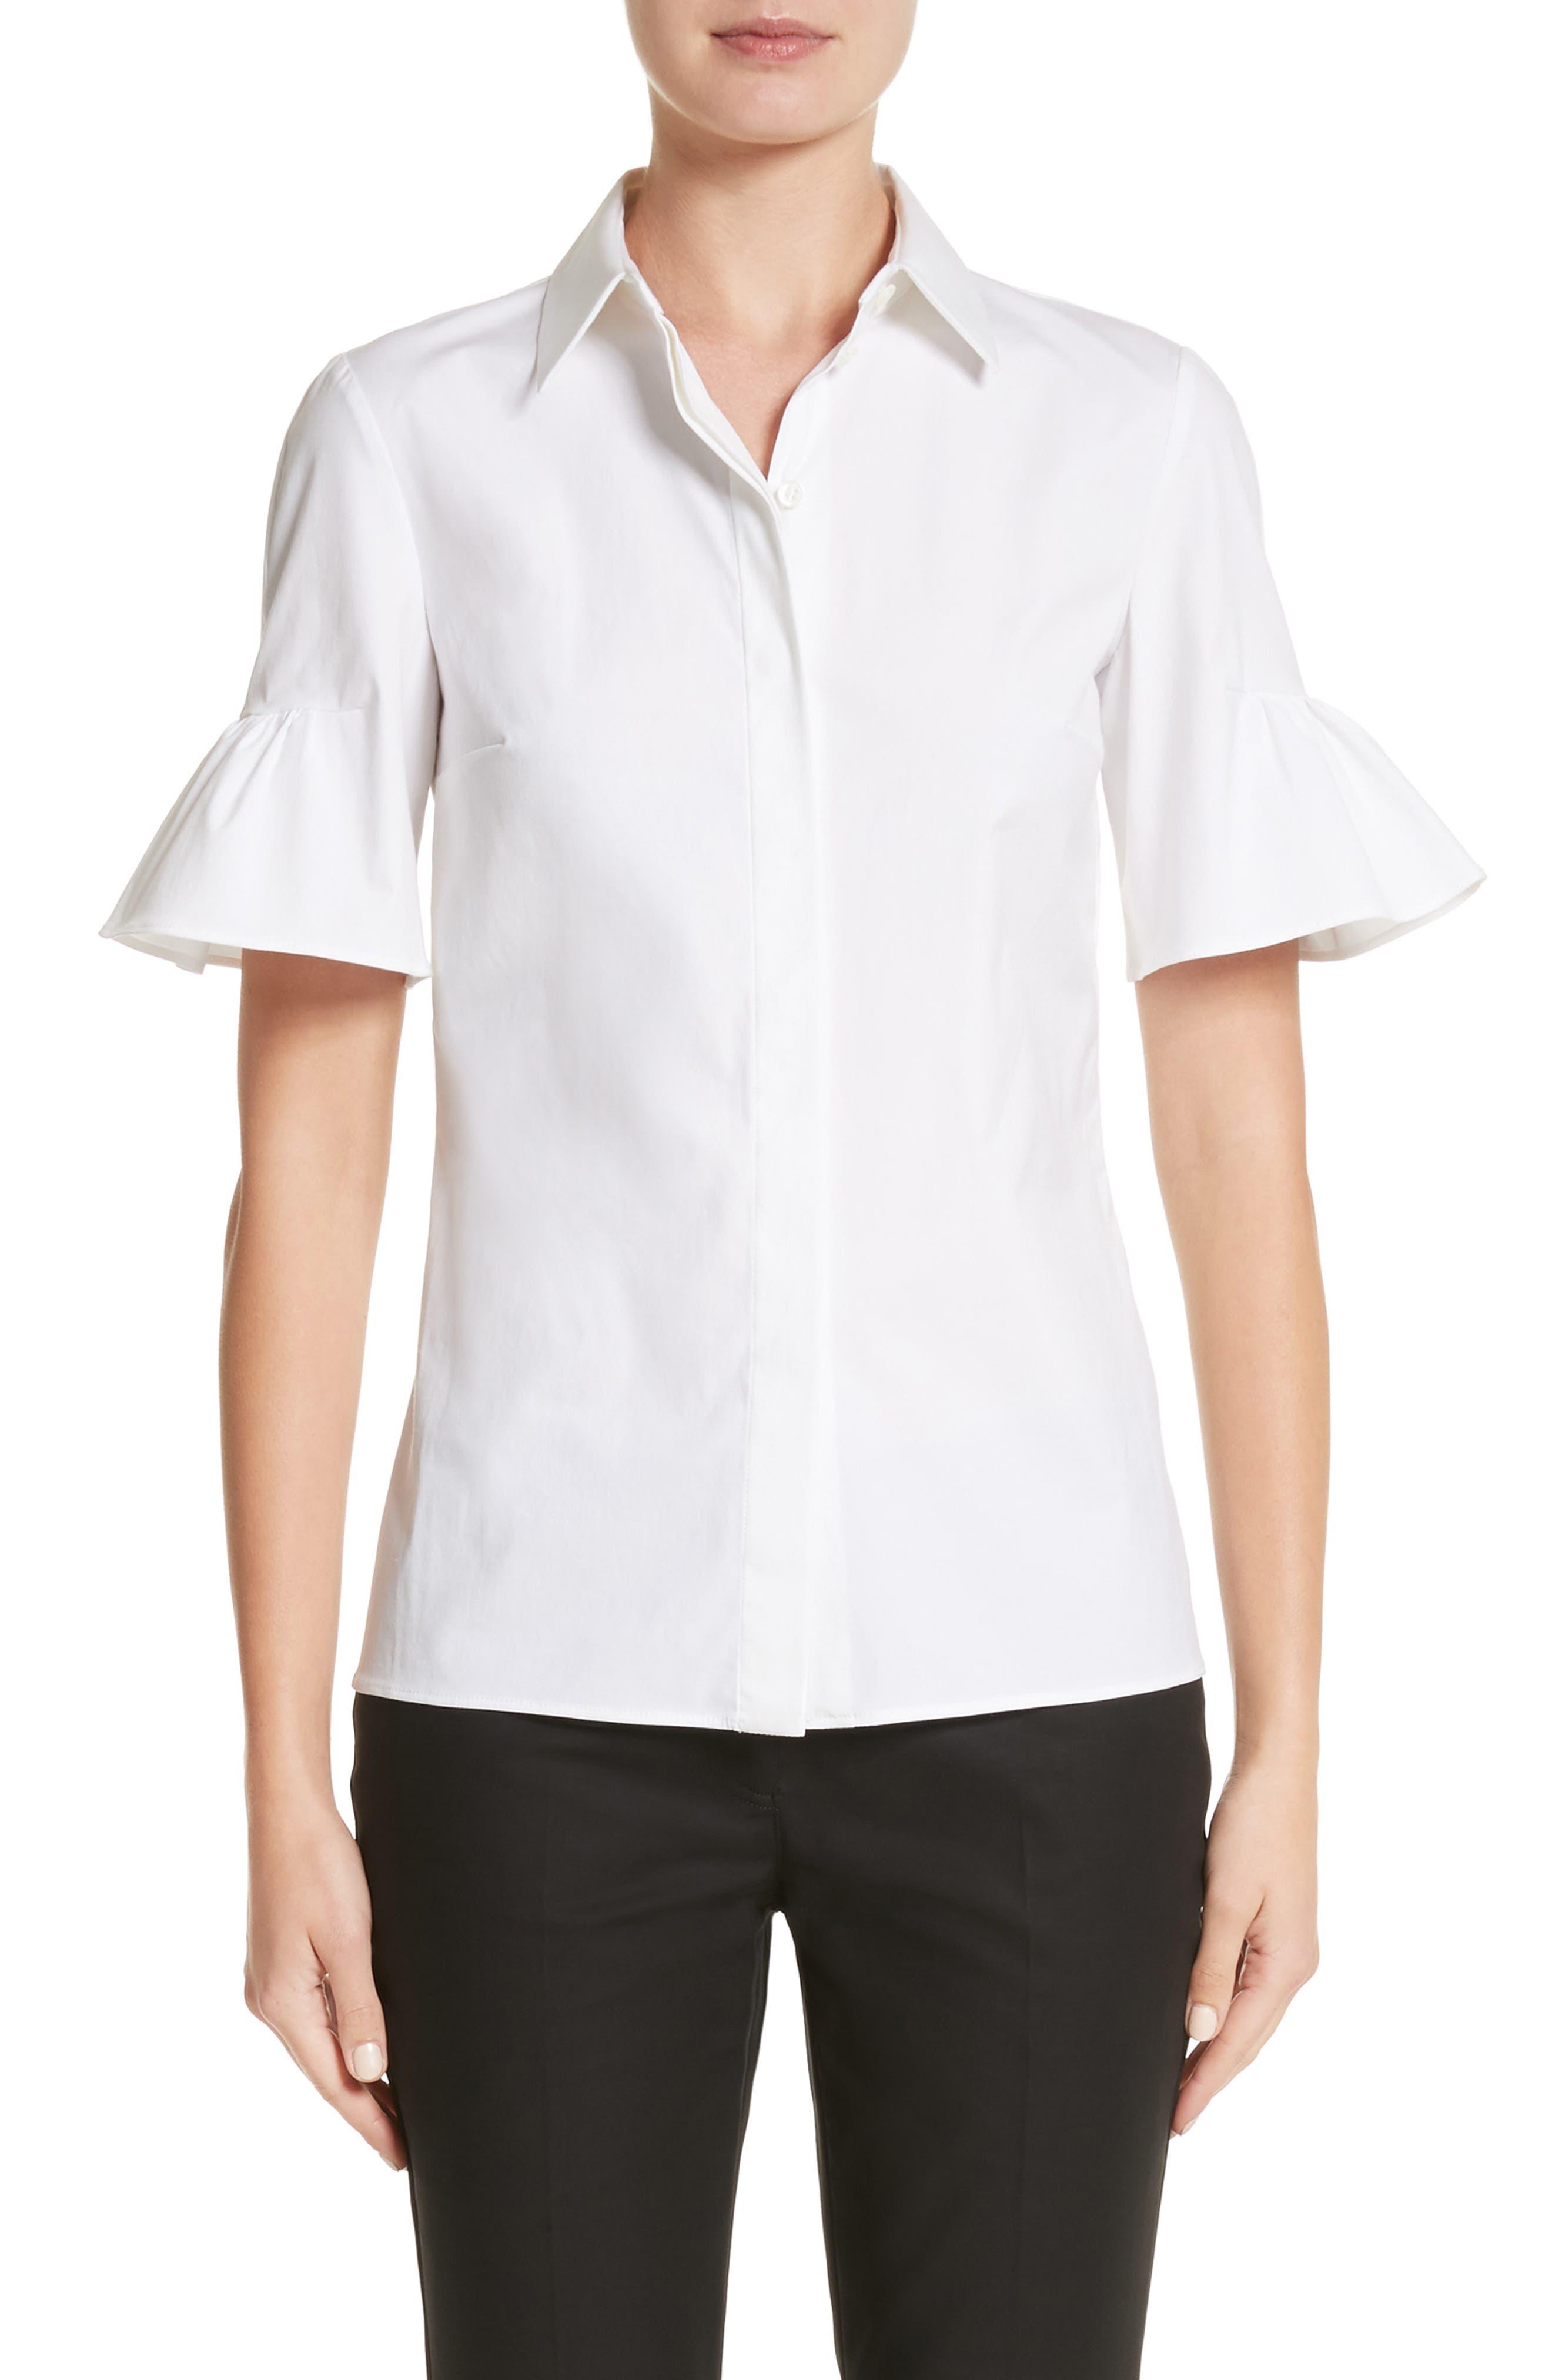 Main Image - Michael Kors Bell Sleeve Shirt